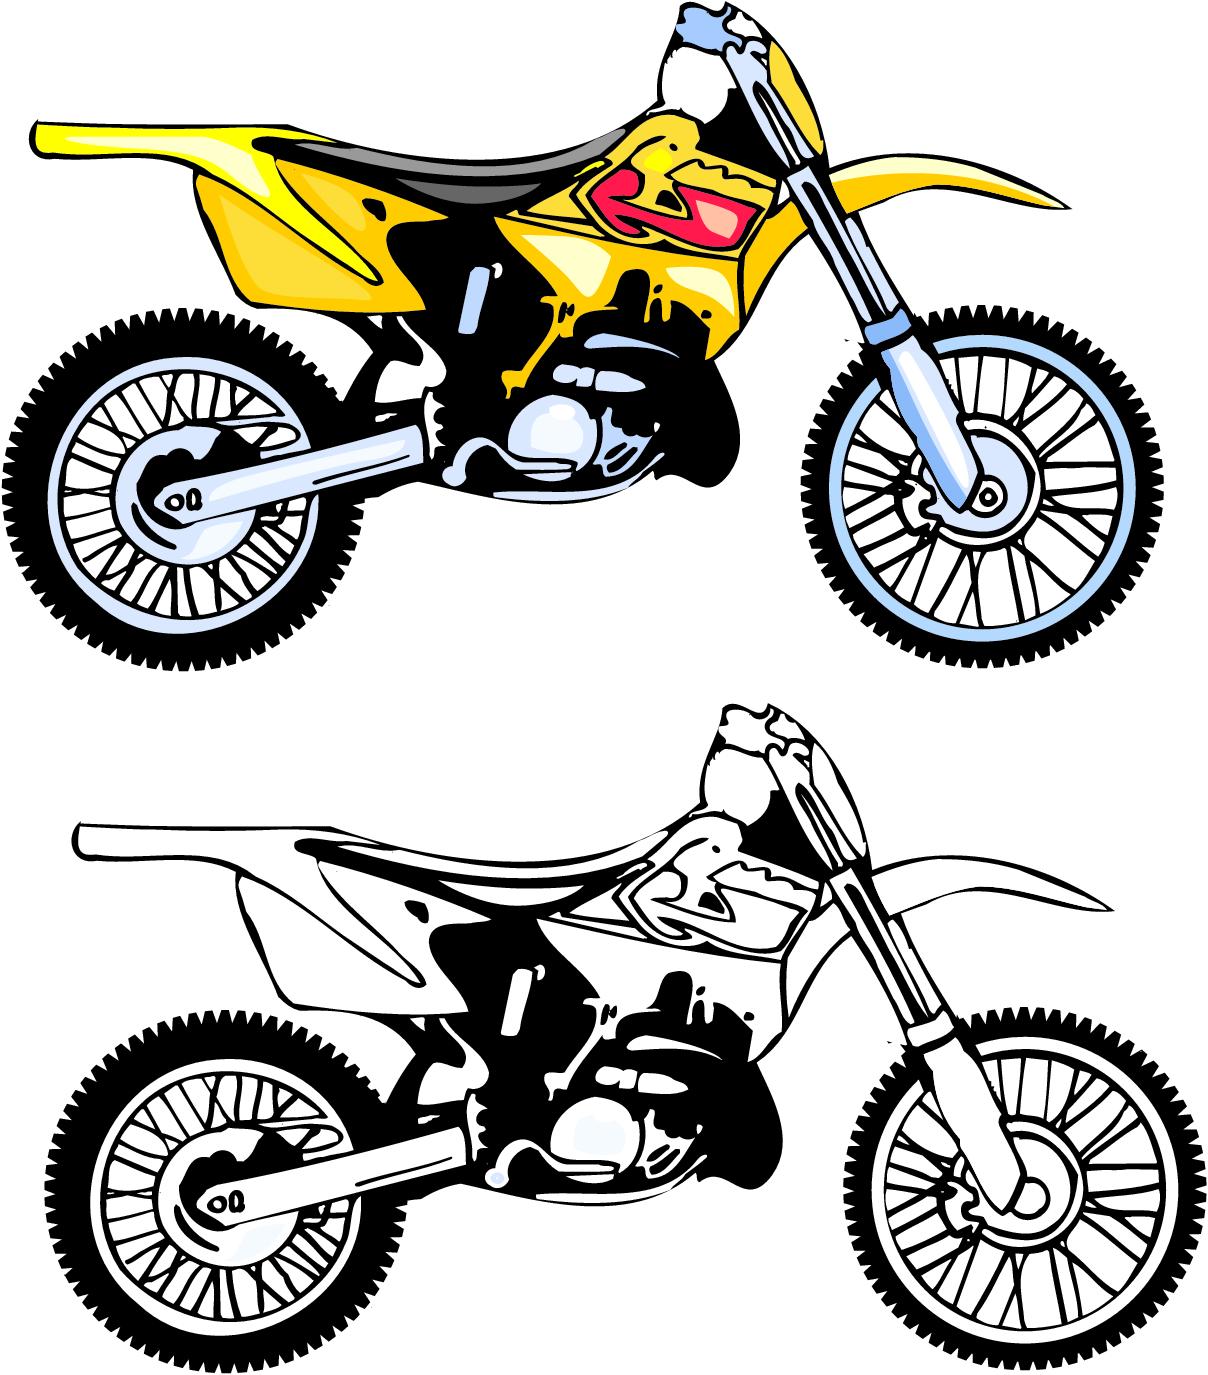 free motorcycle clip art clipart panda free clipart images rh clipartpanda com free motorcycle clip art pictures free motorcycle clip art pictures